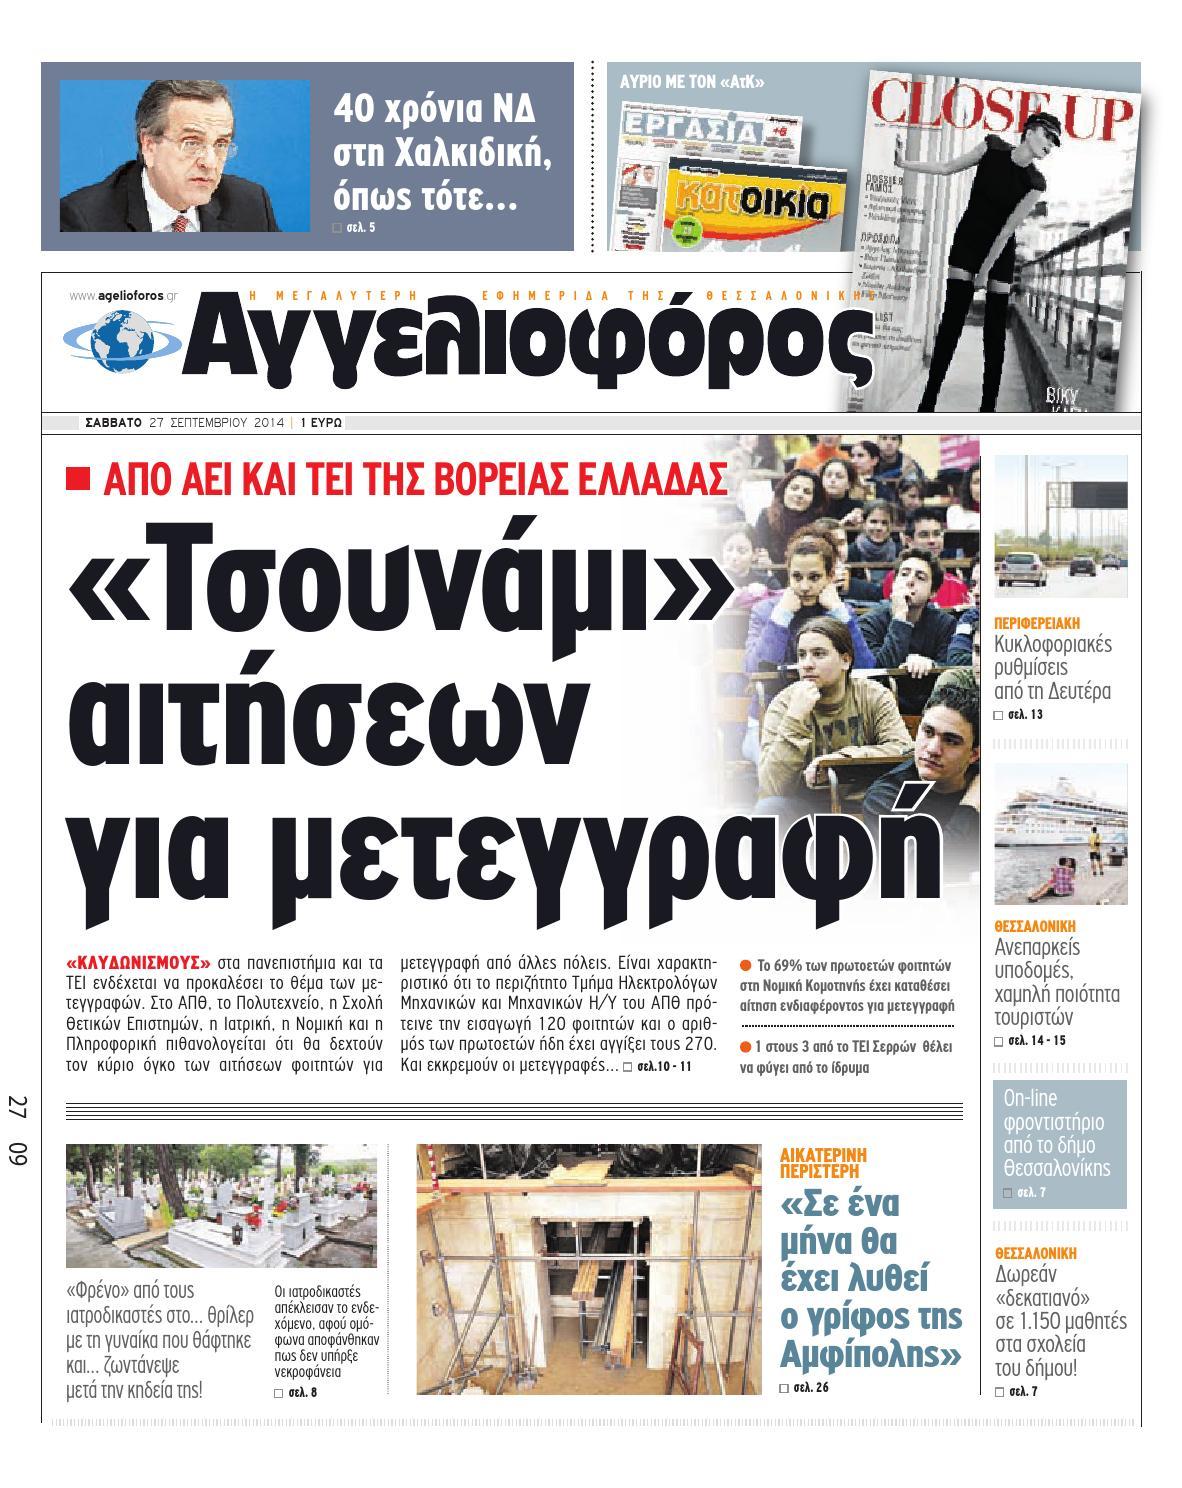 2933a51c37 Αγγελιοφόρος 27 09 2014 by Εκδοτική Βορείου Ελλάδος Α.Ε. - issuu